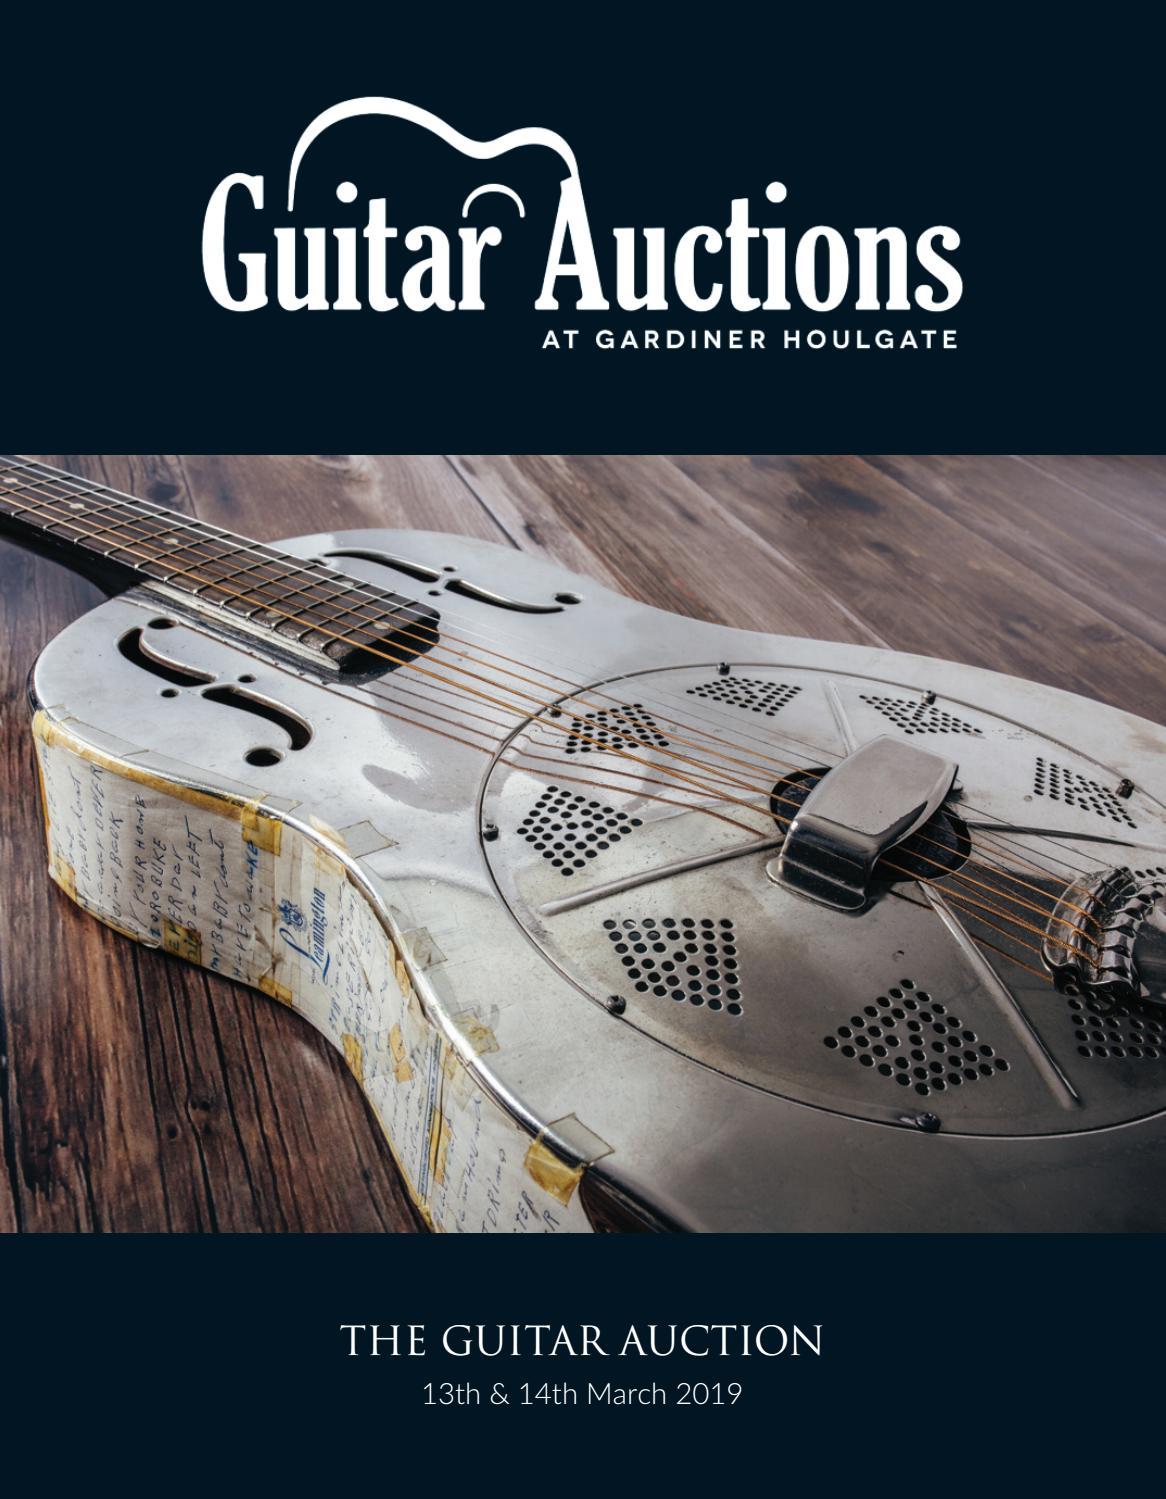 Greco Guitar Es 920 Wiring Diagram from image.isu.pub